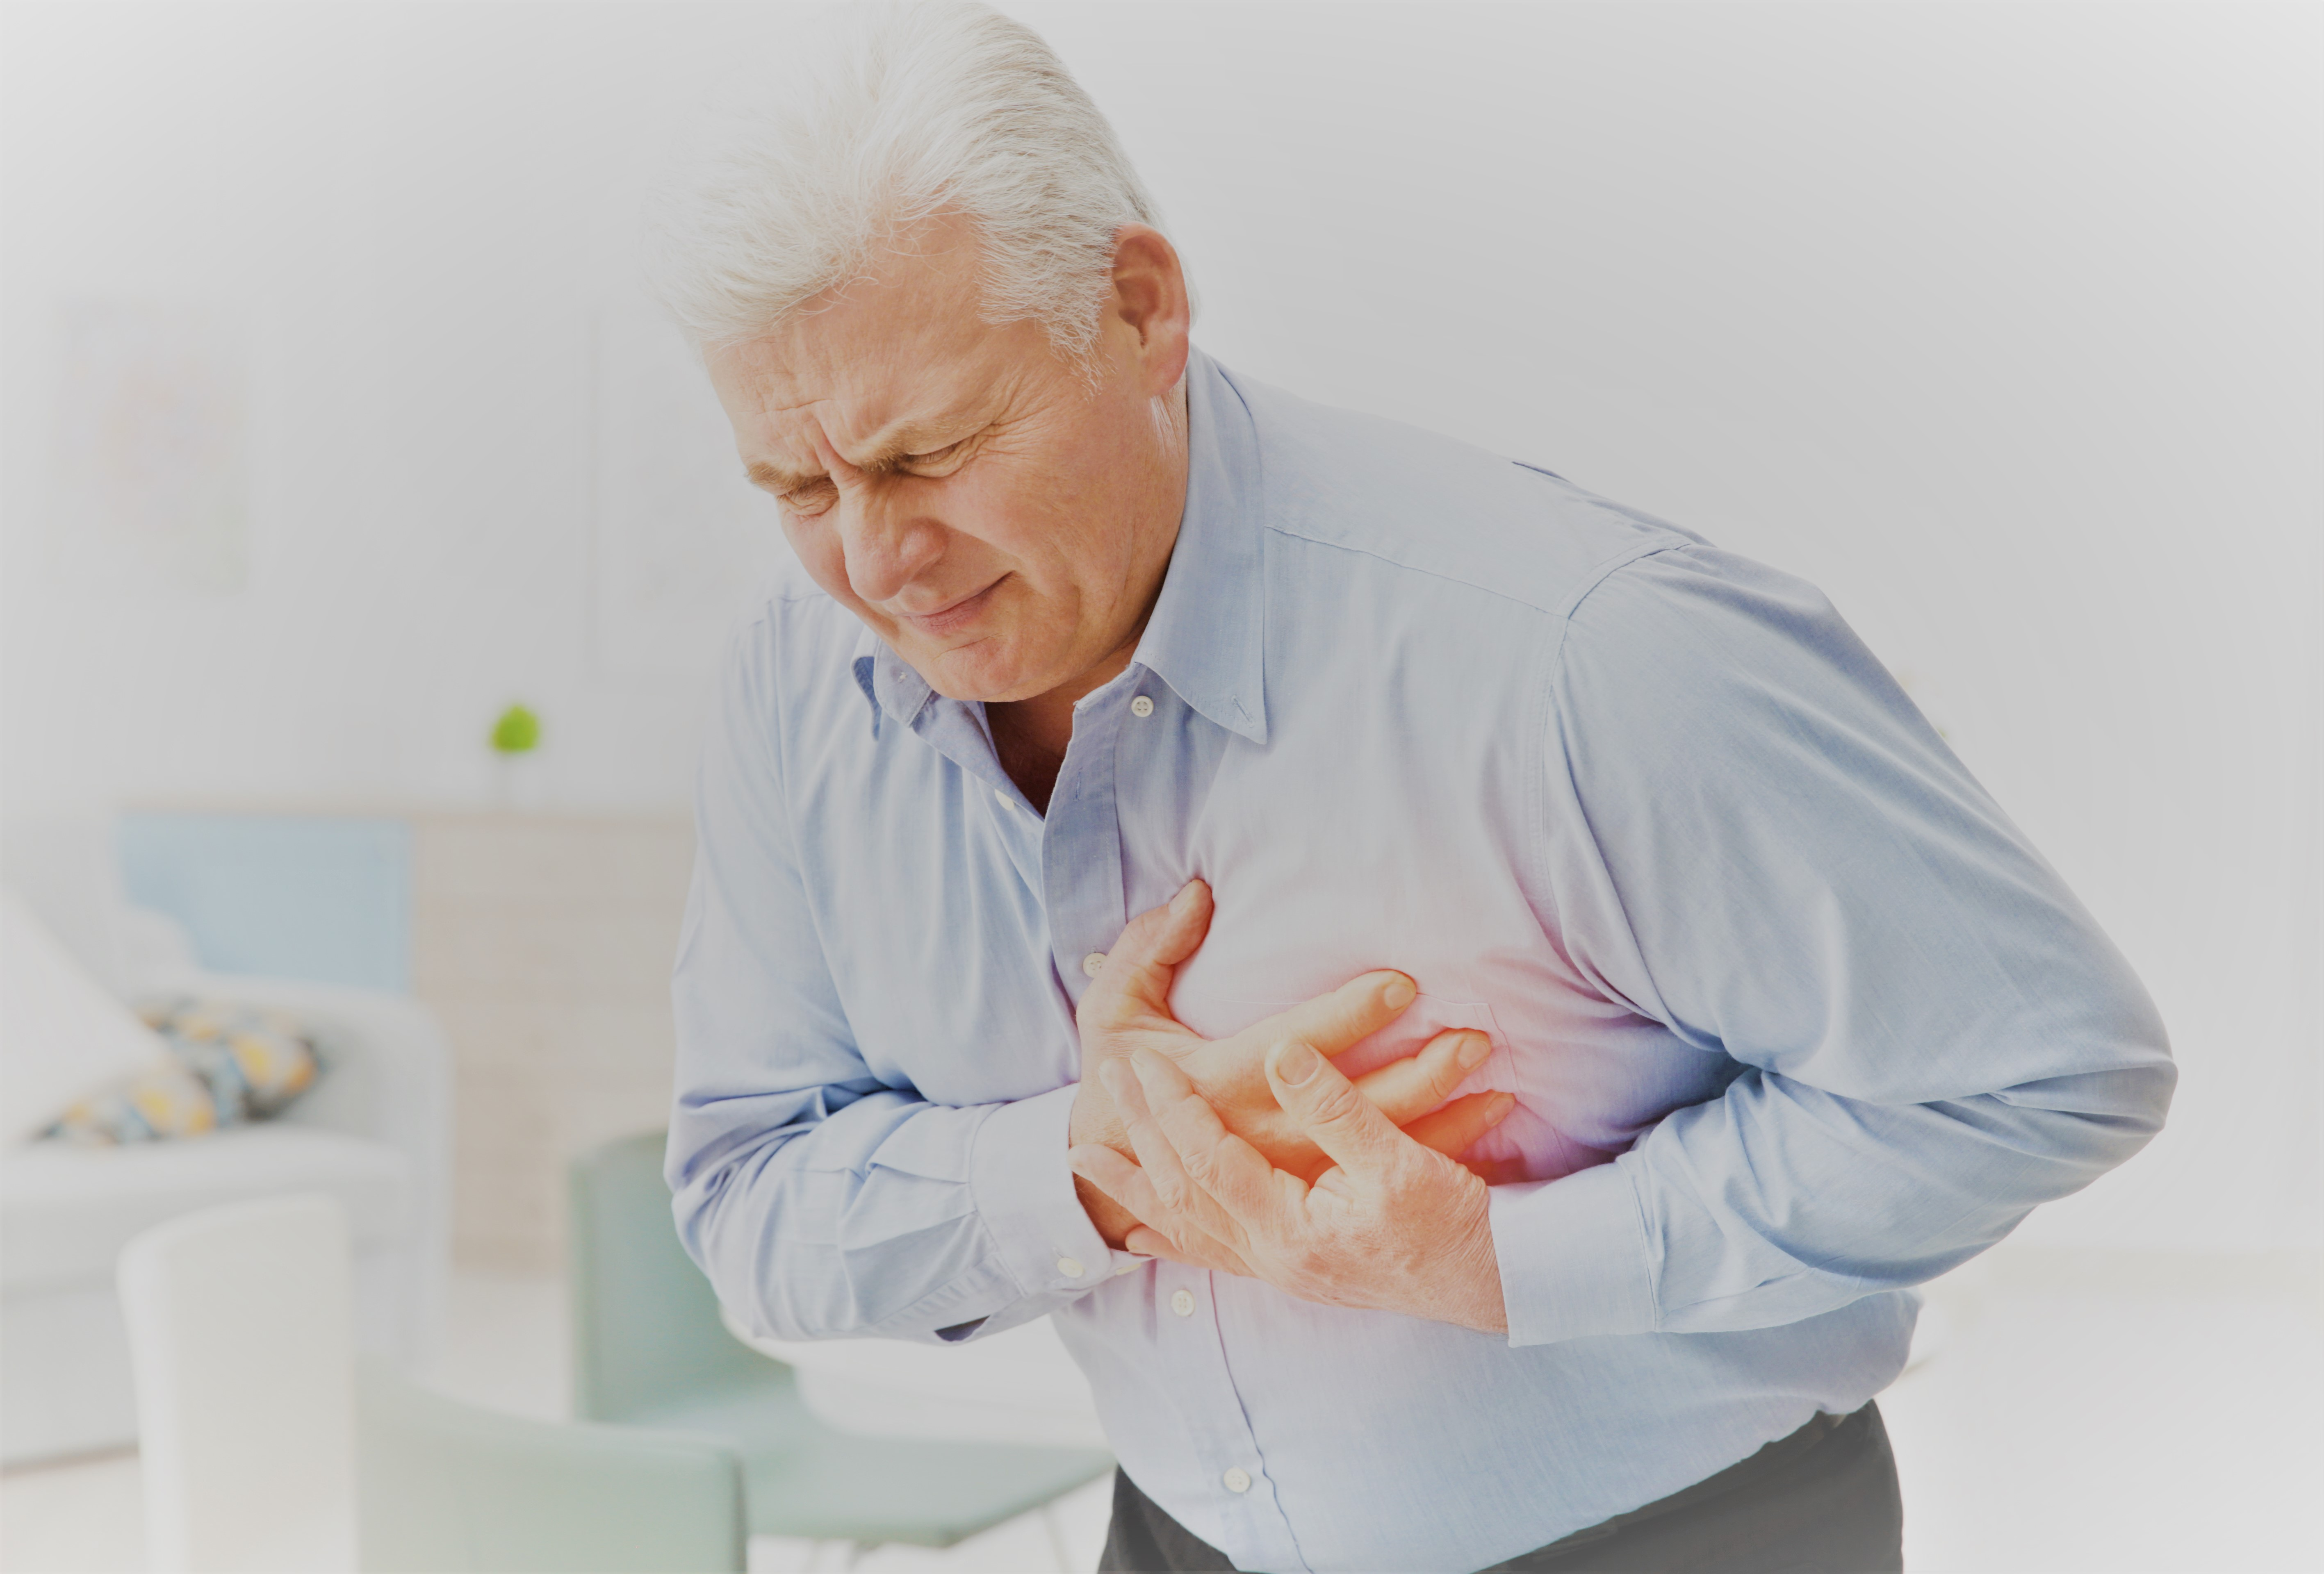 magas nyomású ízületi fájdalom